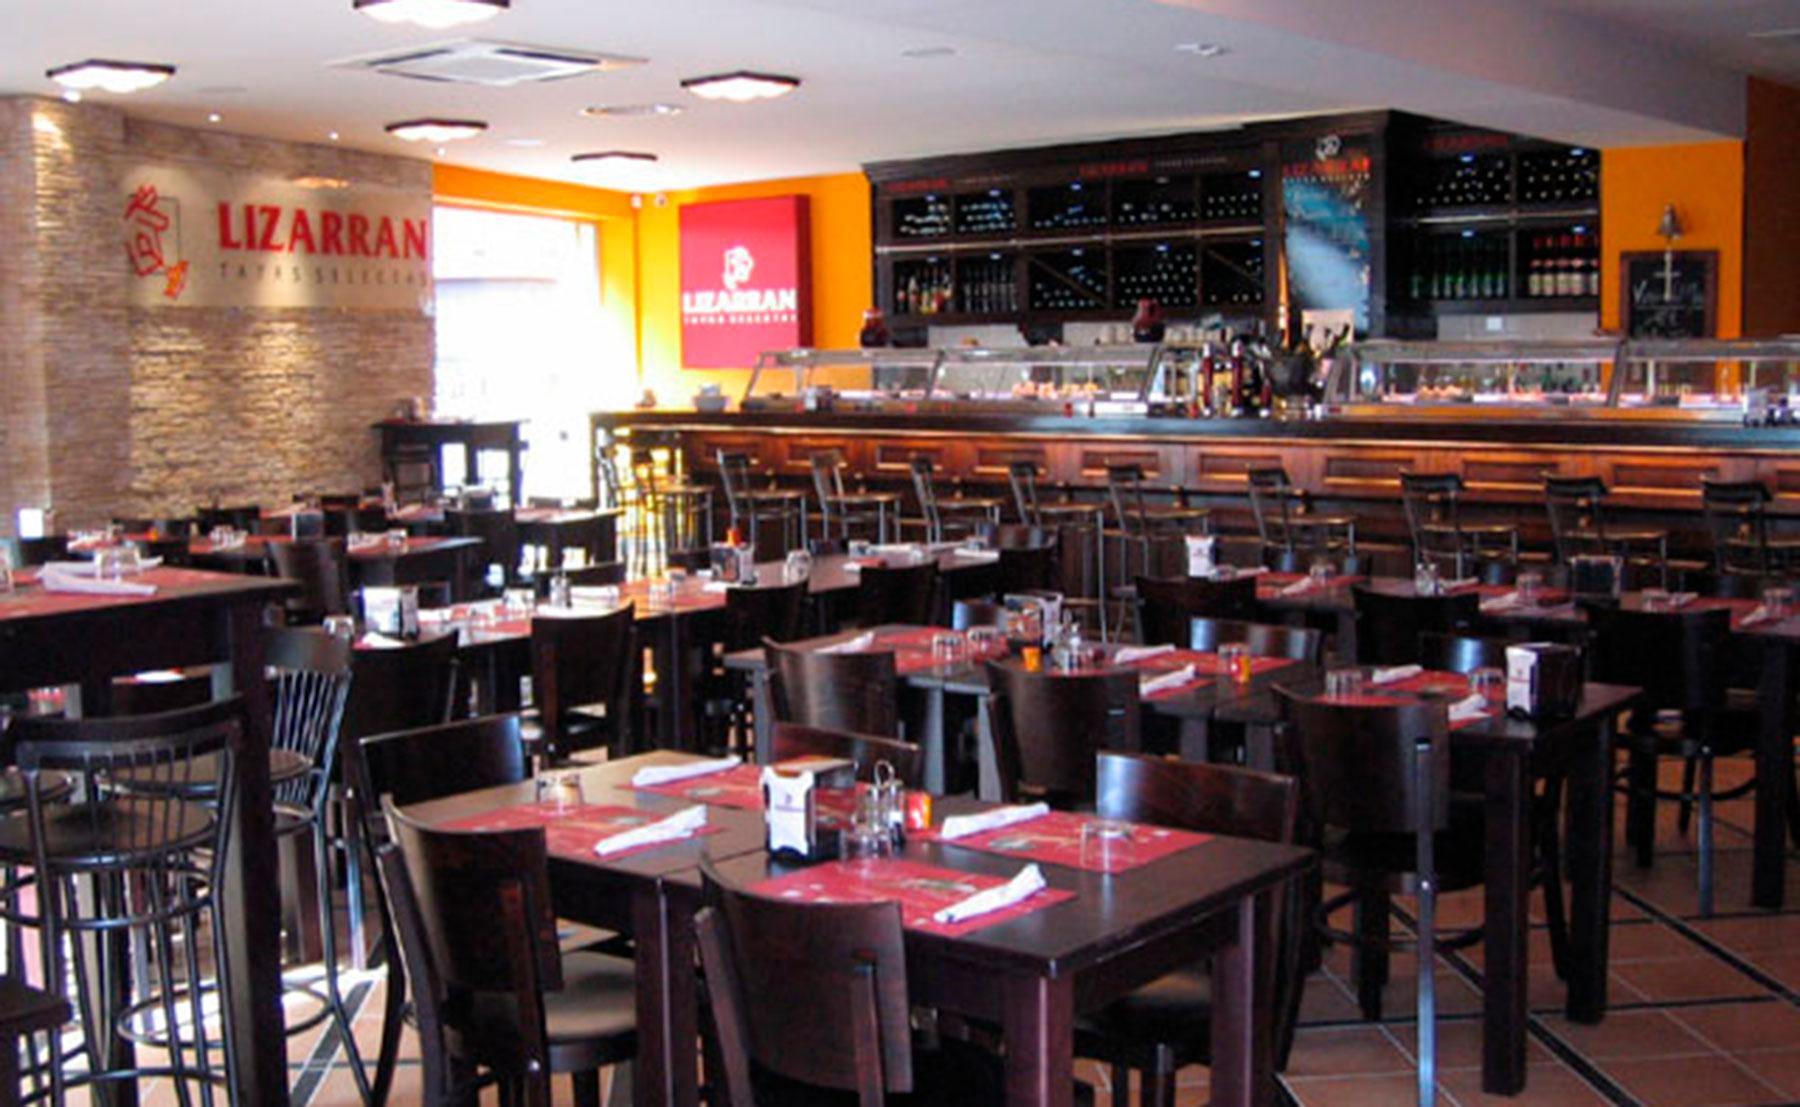 Restaurant LIZARRAN Toulouse